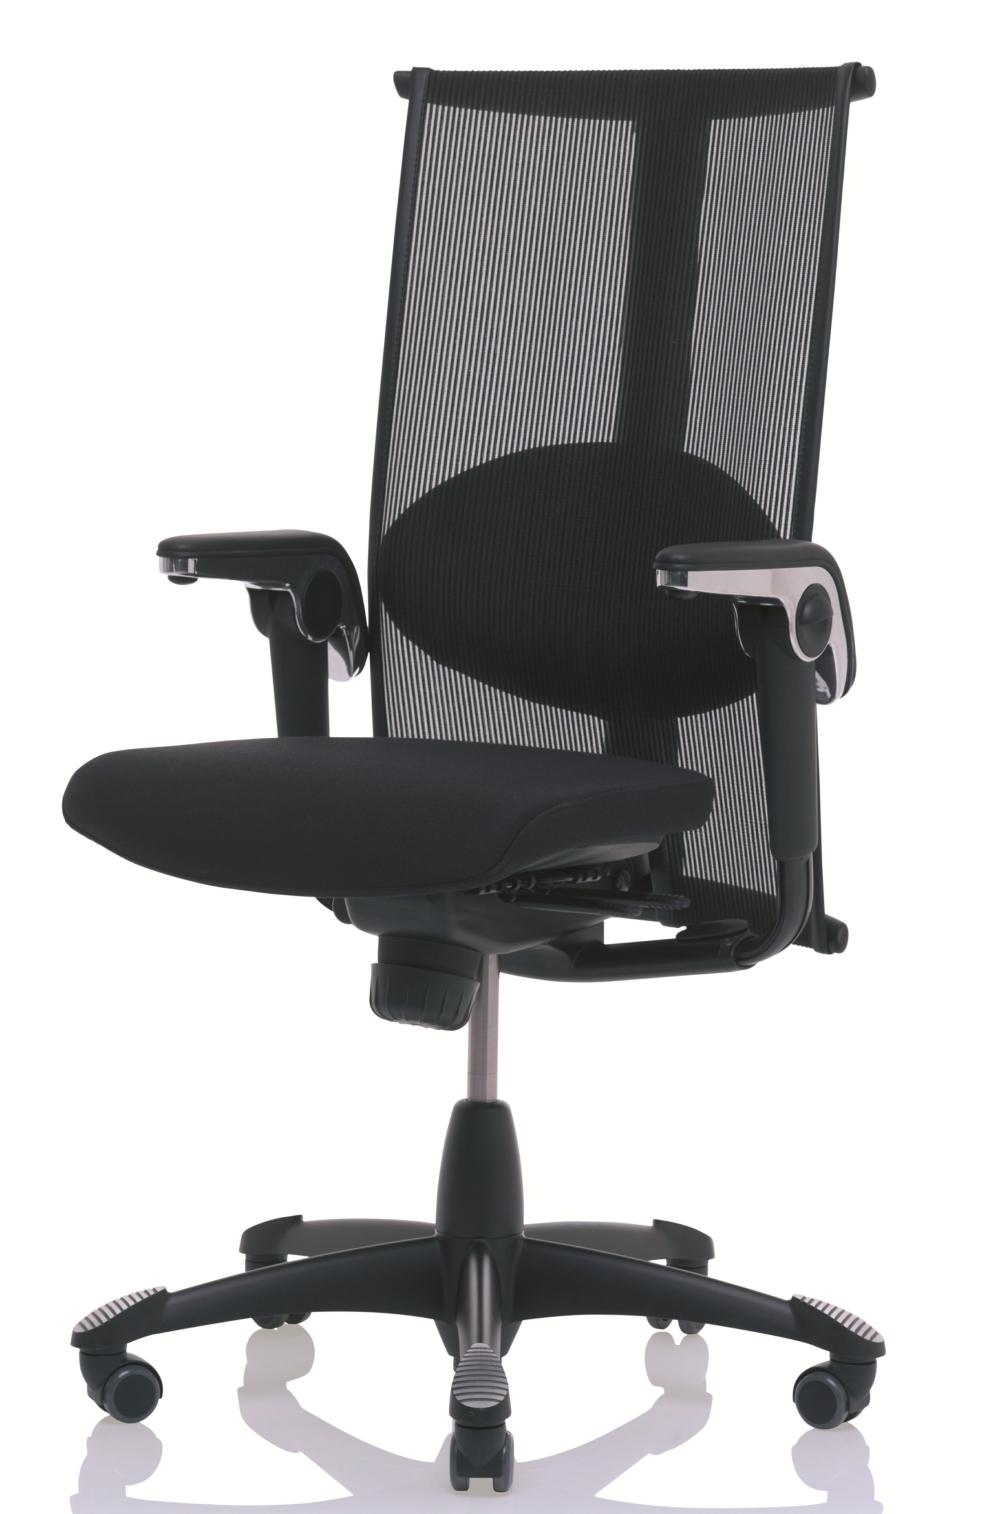 HAG H09 Inspiration 9220 Chair